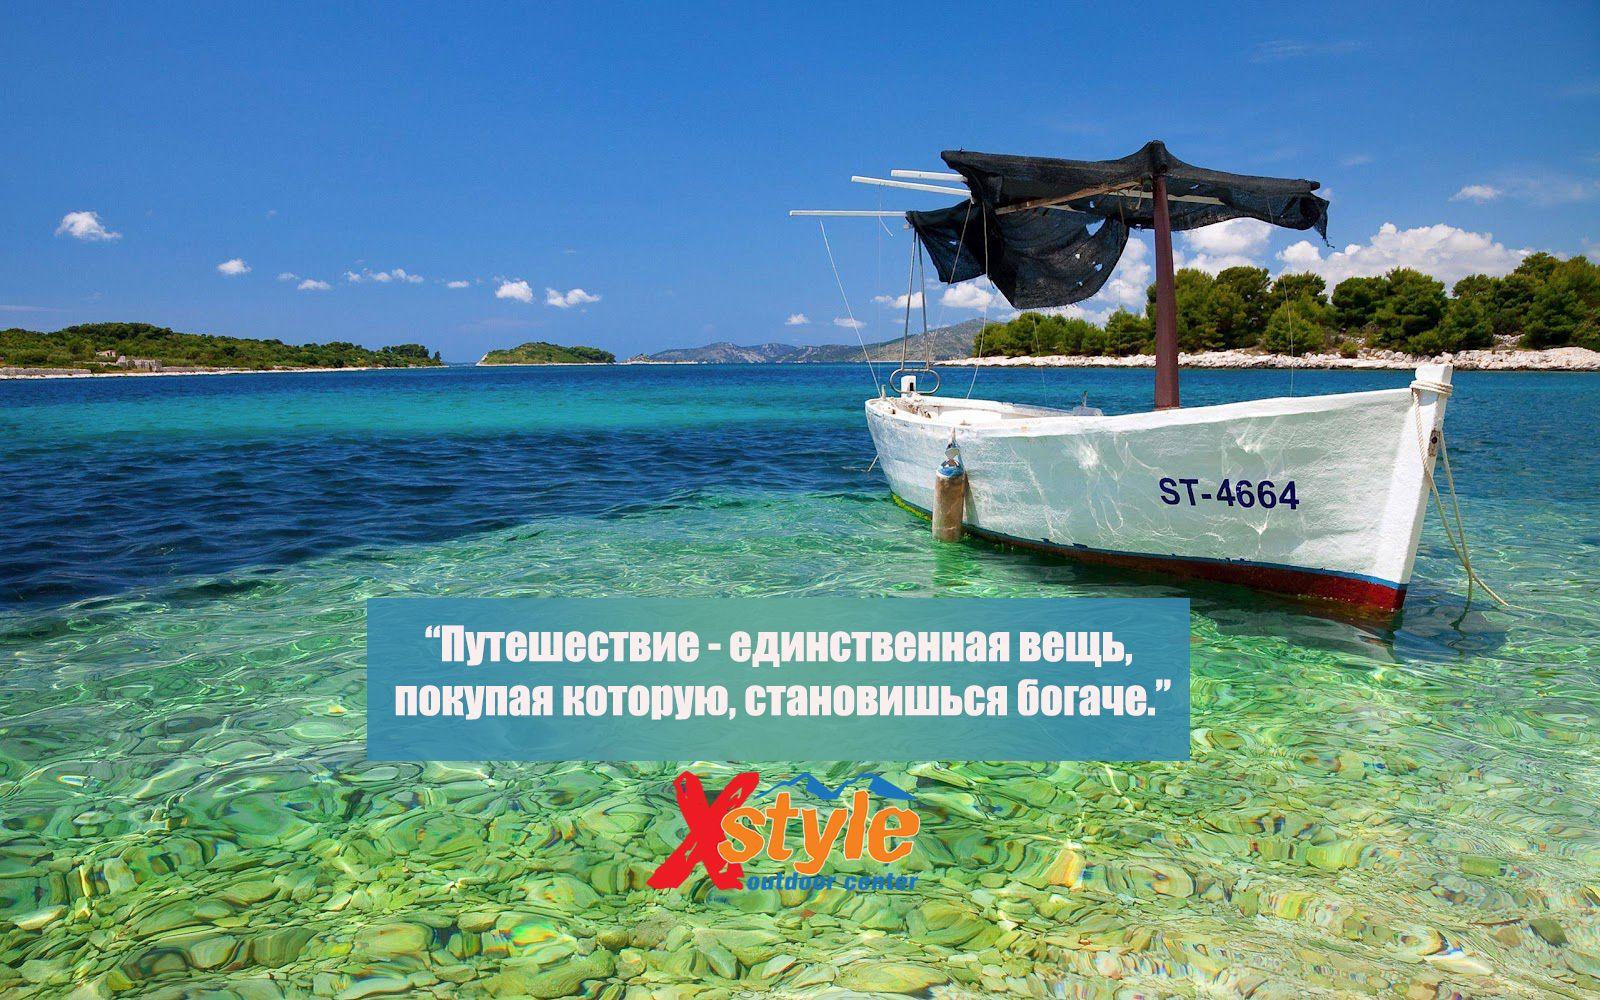 www.xstyle.md   Обои с пляжем, Места для посещения ...